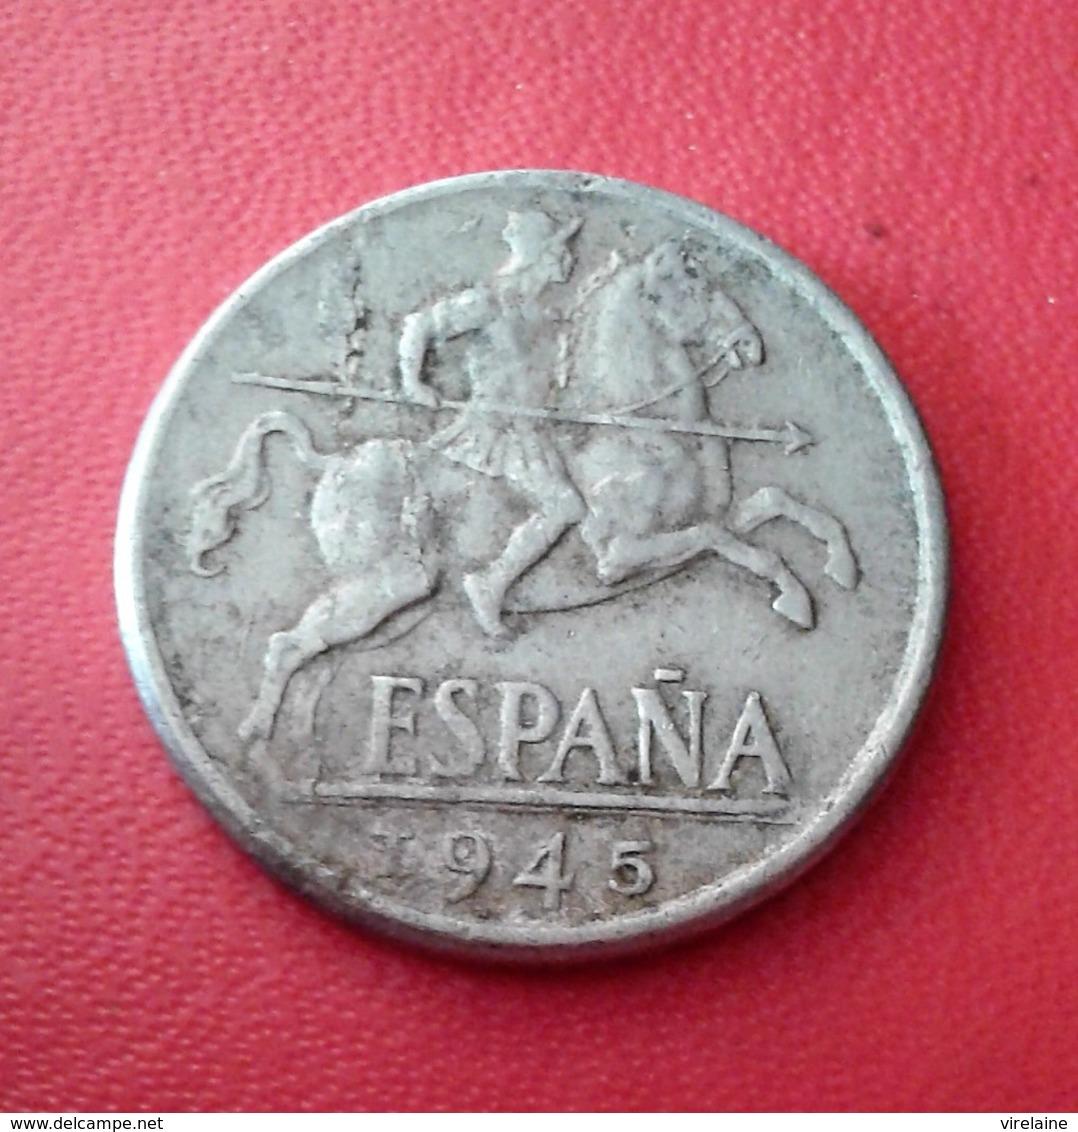 ESPAGNE 10 CENTIMOS 1945 N° 230D - 10 Centimos